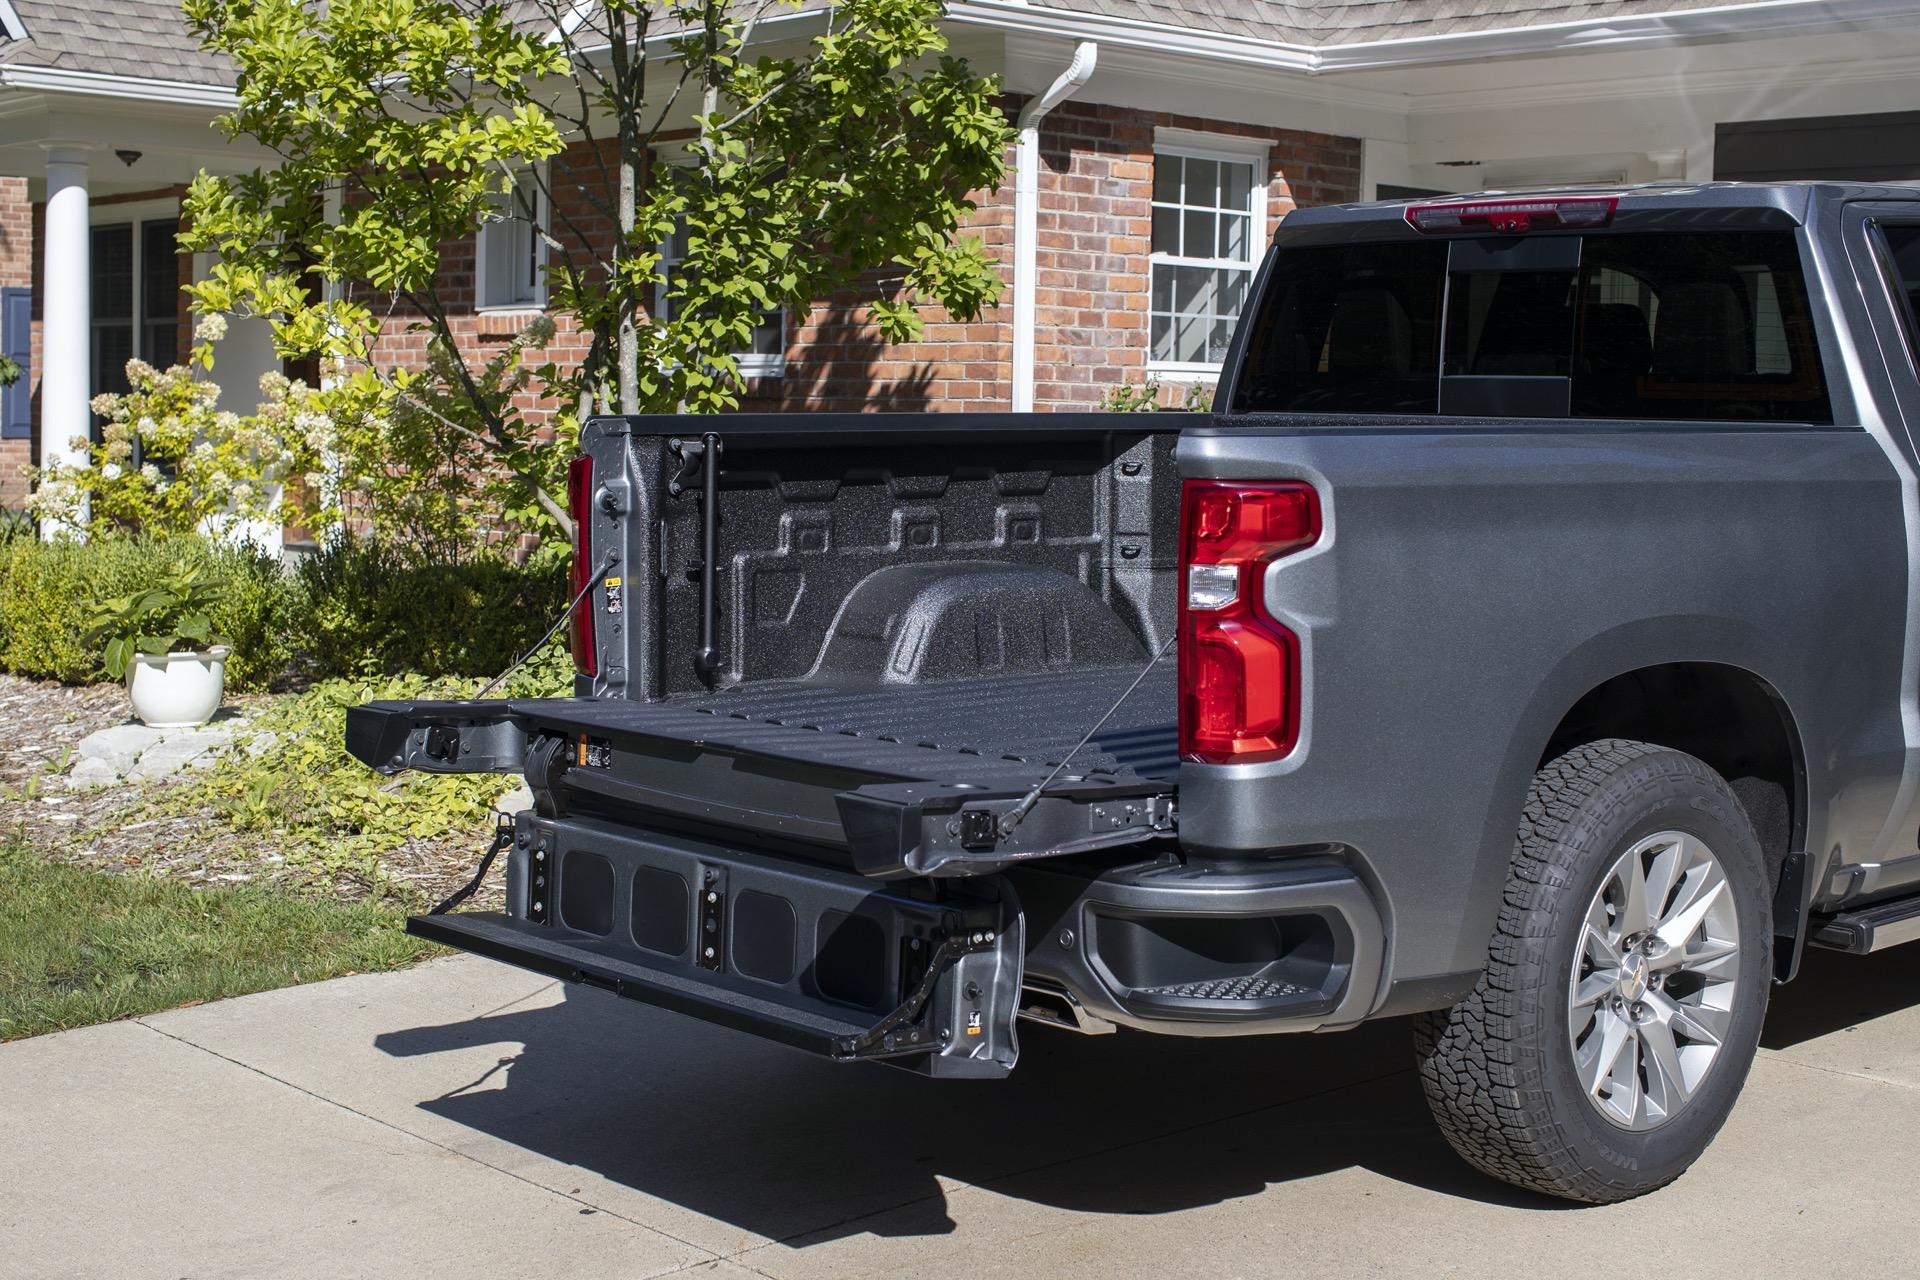 2021 Chevrolet Silverado gets 6-way tailgate, more towing ...